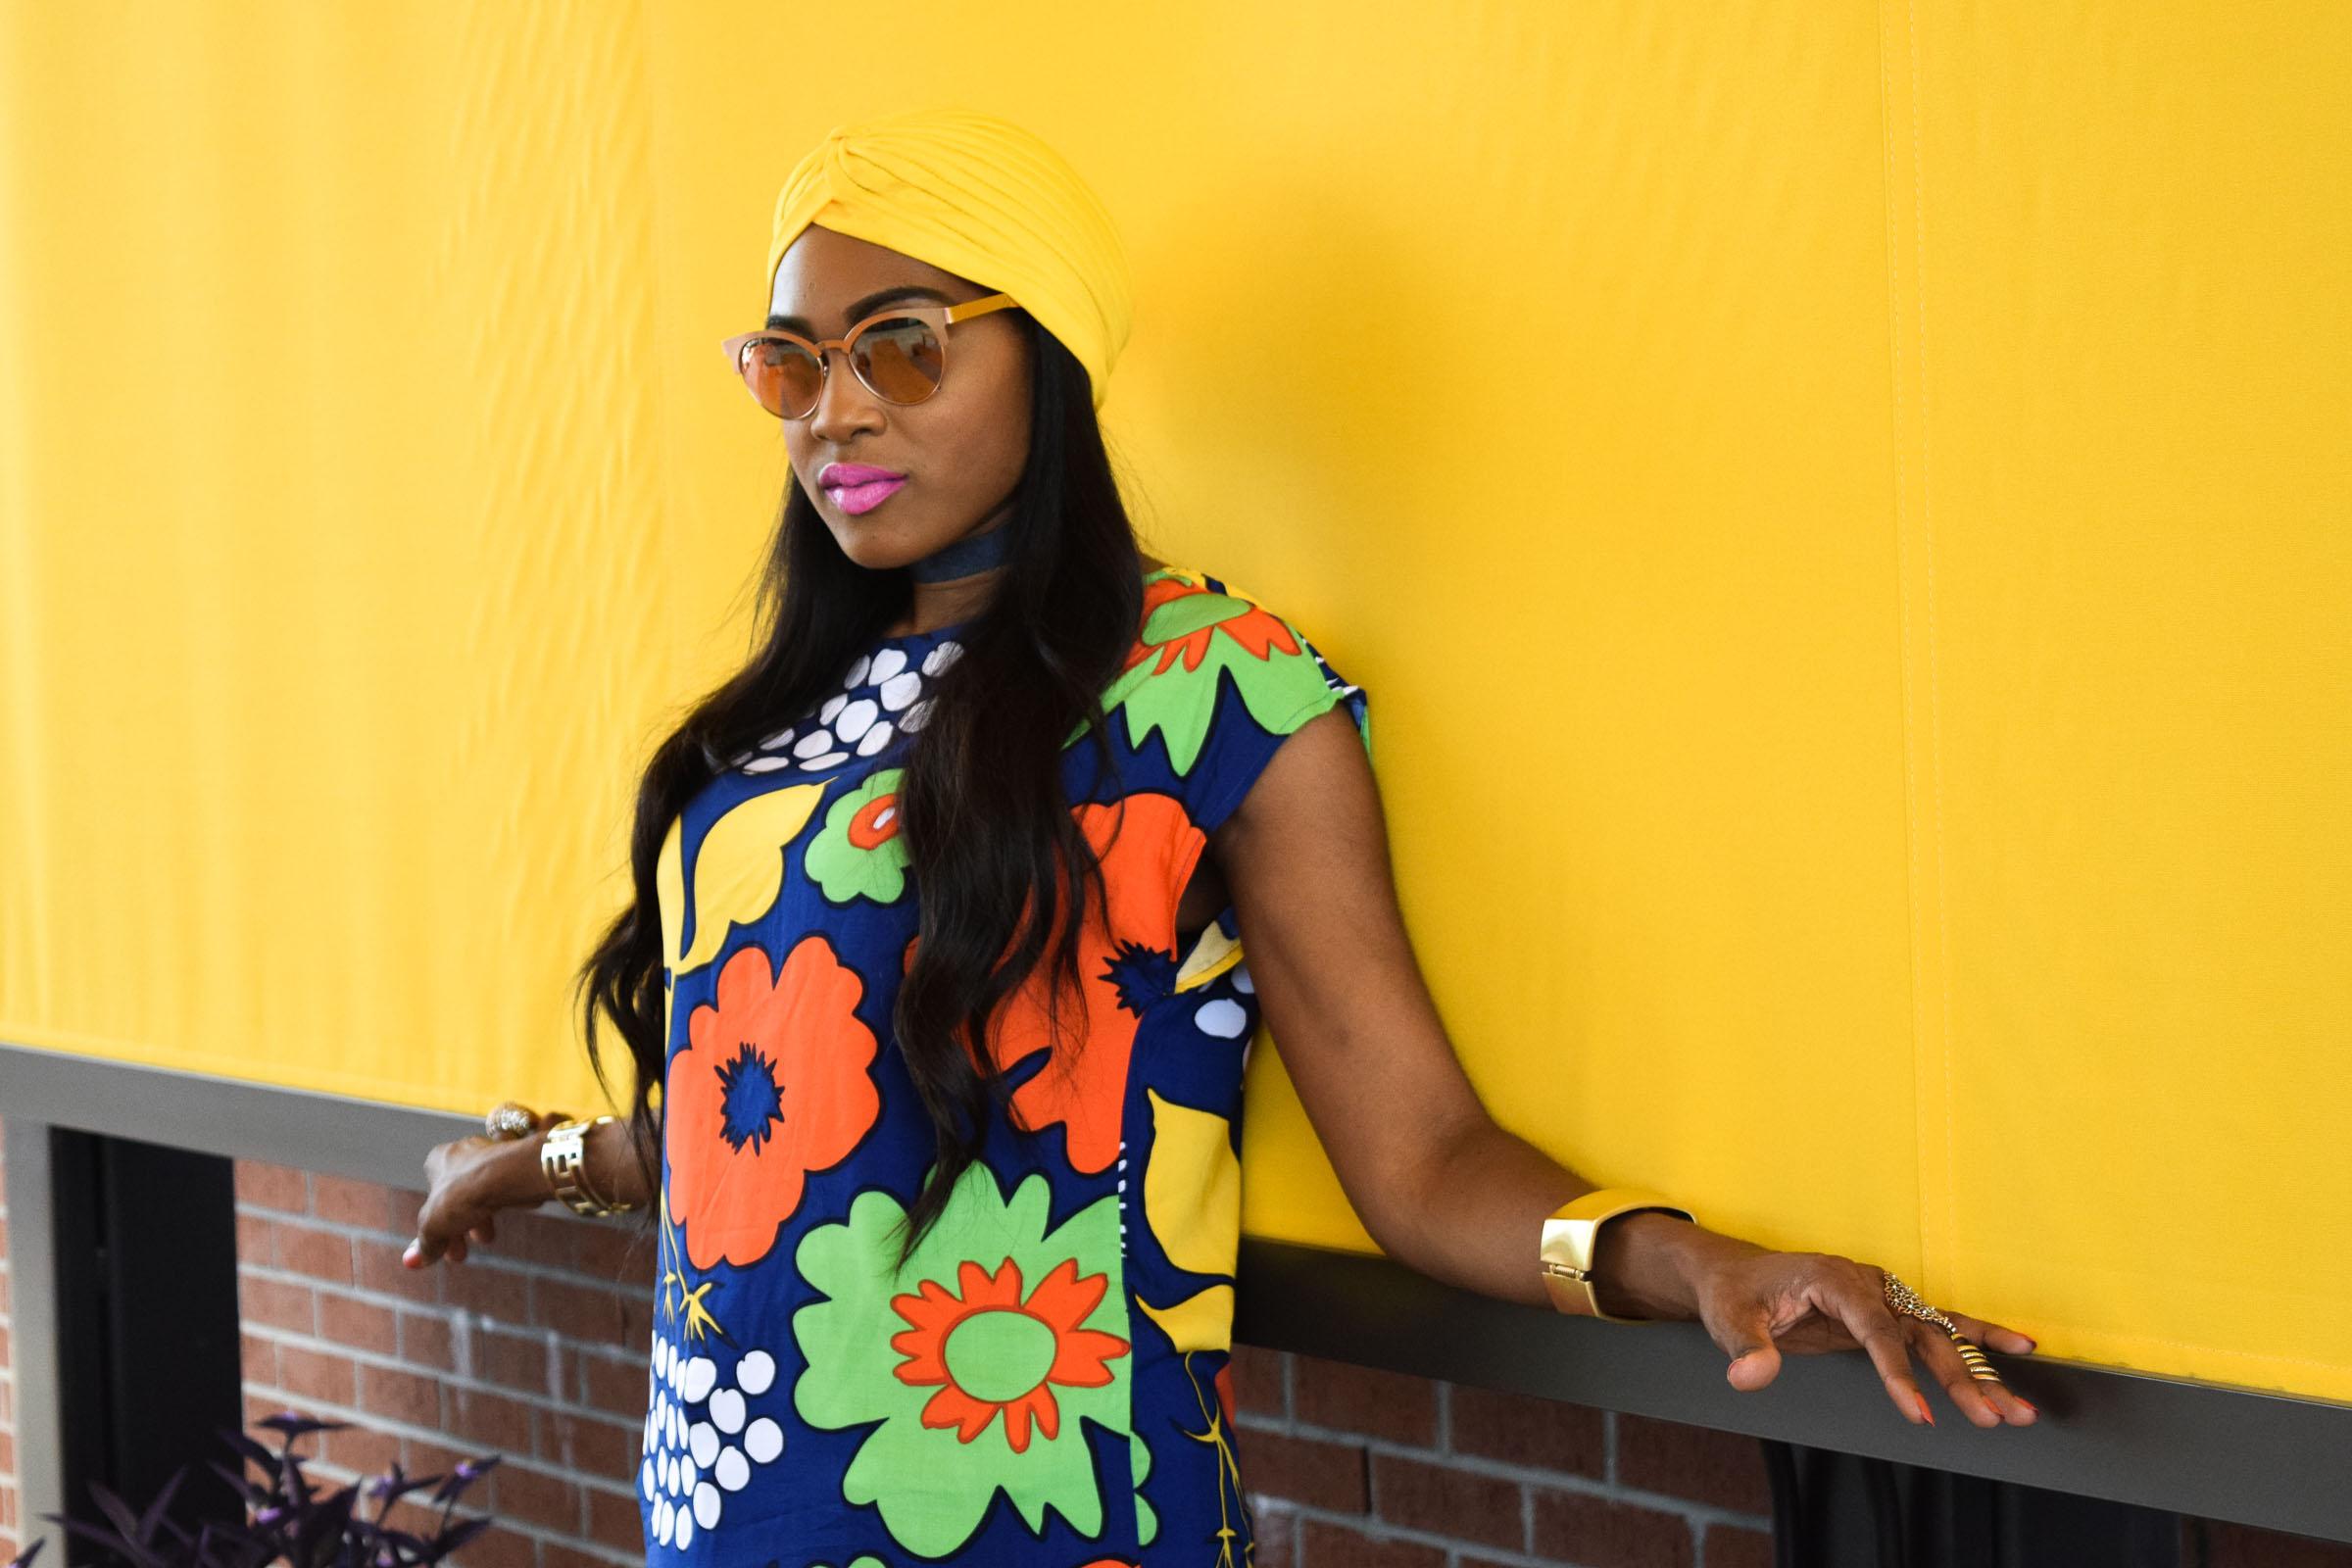 Style-Files-Target-Marimeko-collection -floral-tunic-justfab-tayrey-yellow-fringe-heels-sandals-yellow-turban-asos-denim-choker-oohlalablog-13